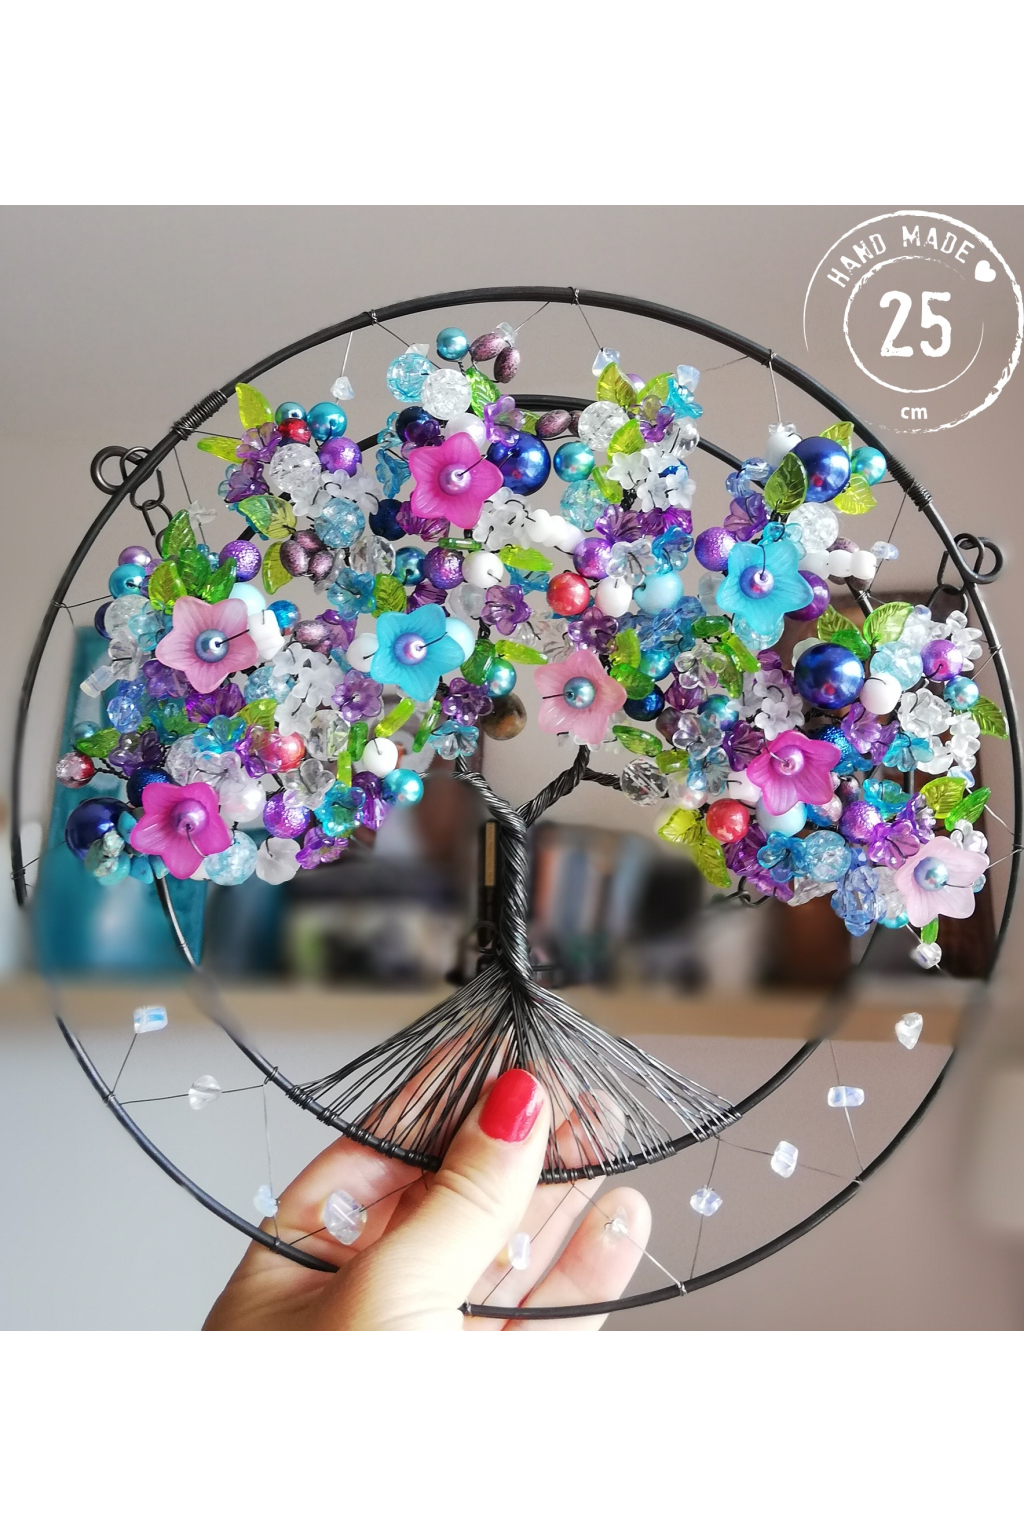 Drátovaný strom - Dotek duše 25cm